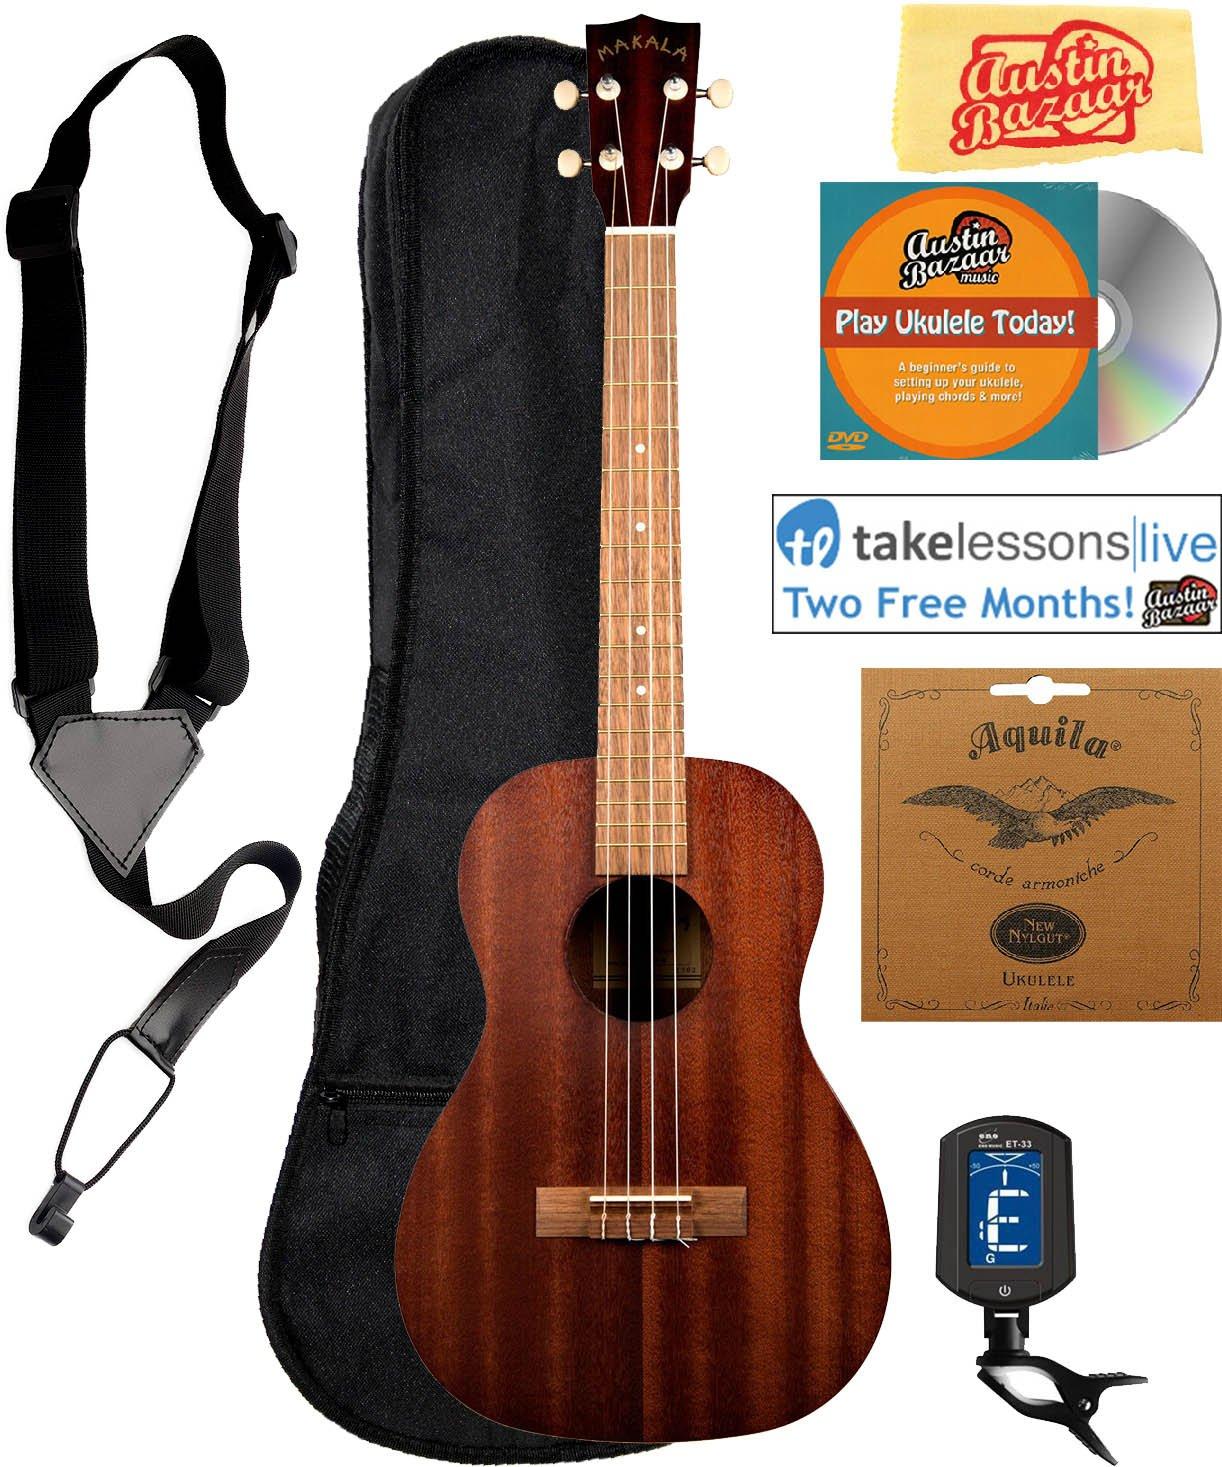 Kala MK-B Makala Baritone Ukulele Bundle with Gig Bag, Tuner, Strap, Aquila Strings, Online Lessons, Austin Bazaar Instructional DVD, and Polishing Cloth